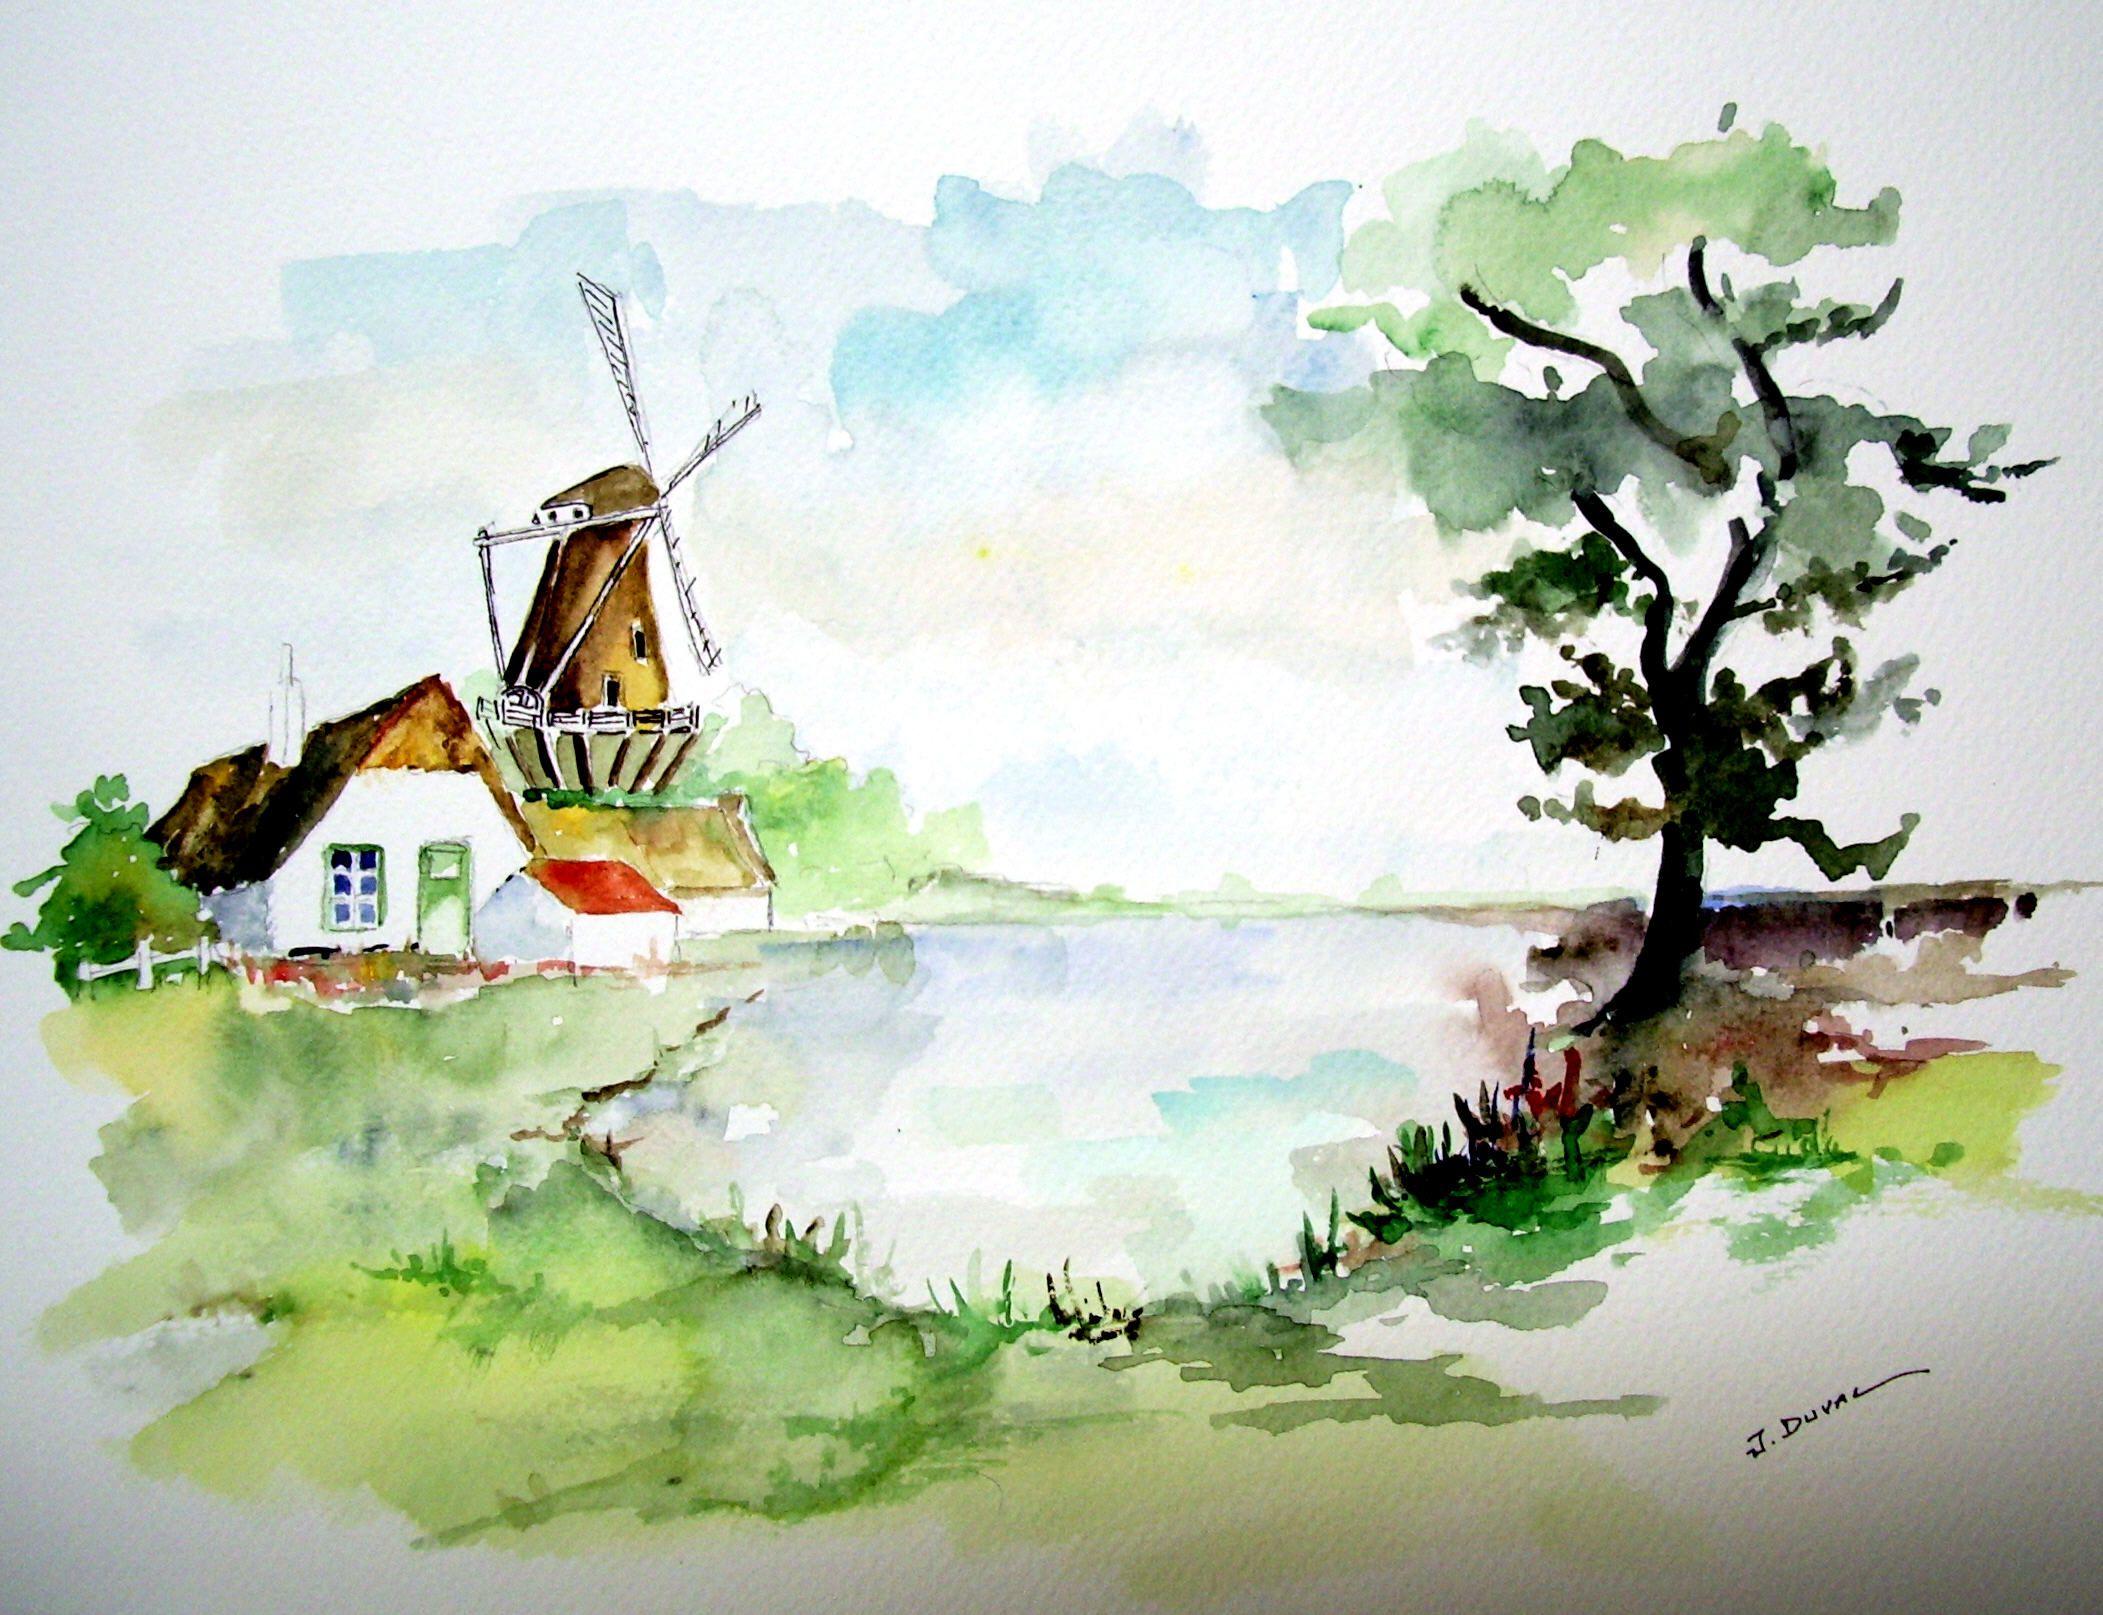 Pin paysage facile a dessiner pelautscom on pinterest - Paysage peinture facile ...